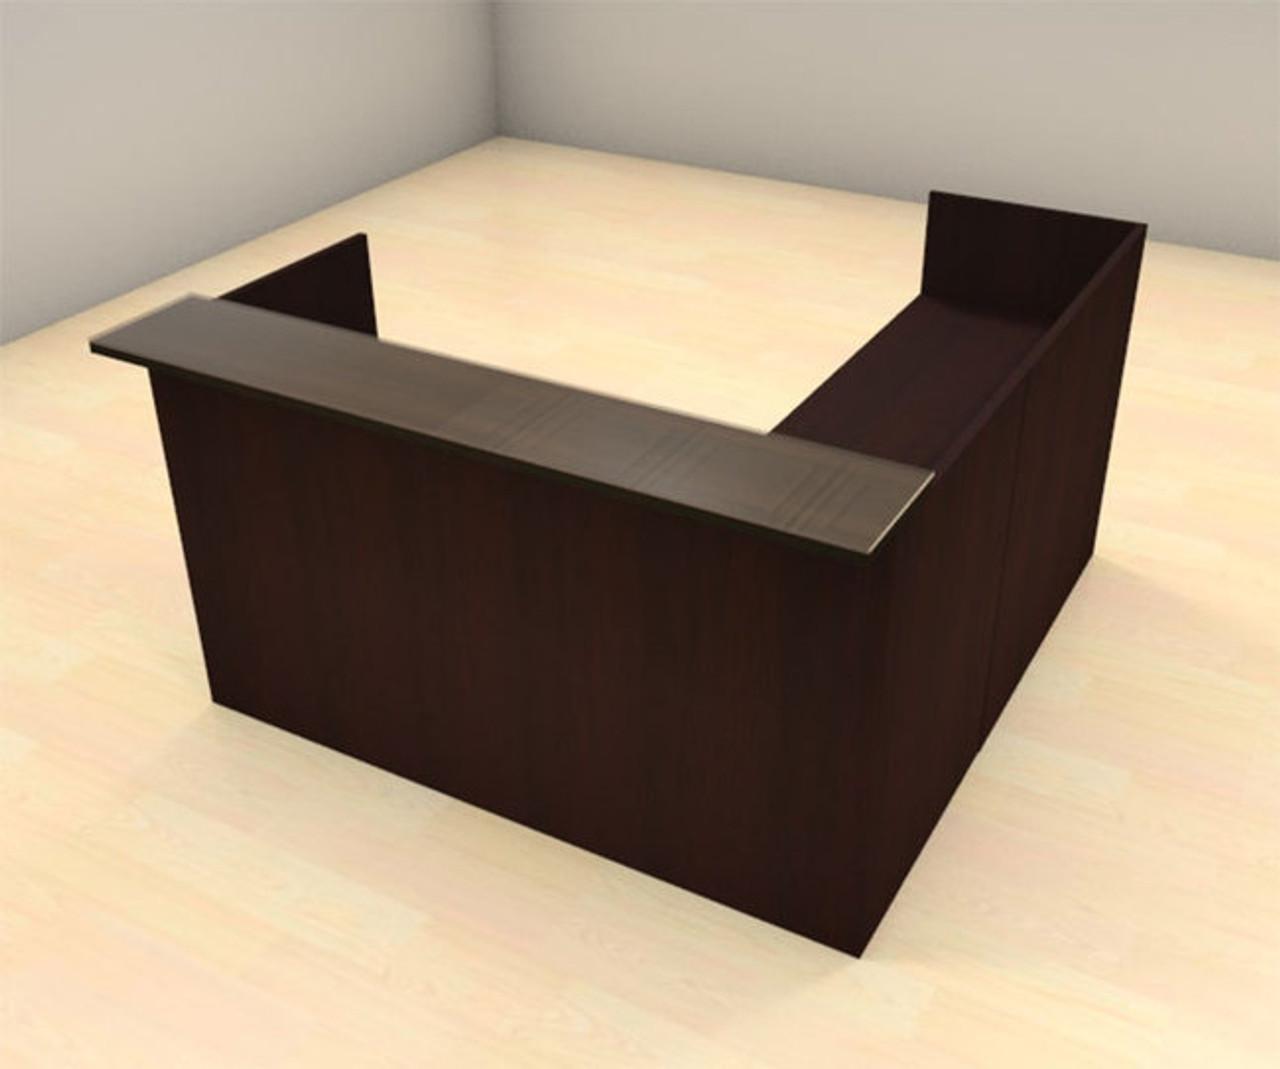 3pc L Shape Modern Glass Counter Reception Desk Set, #CH-AMB-R7